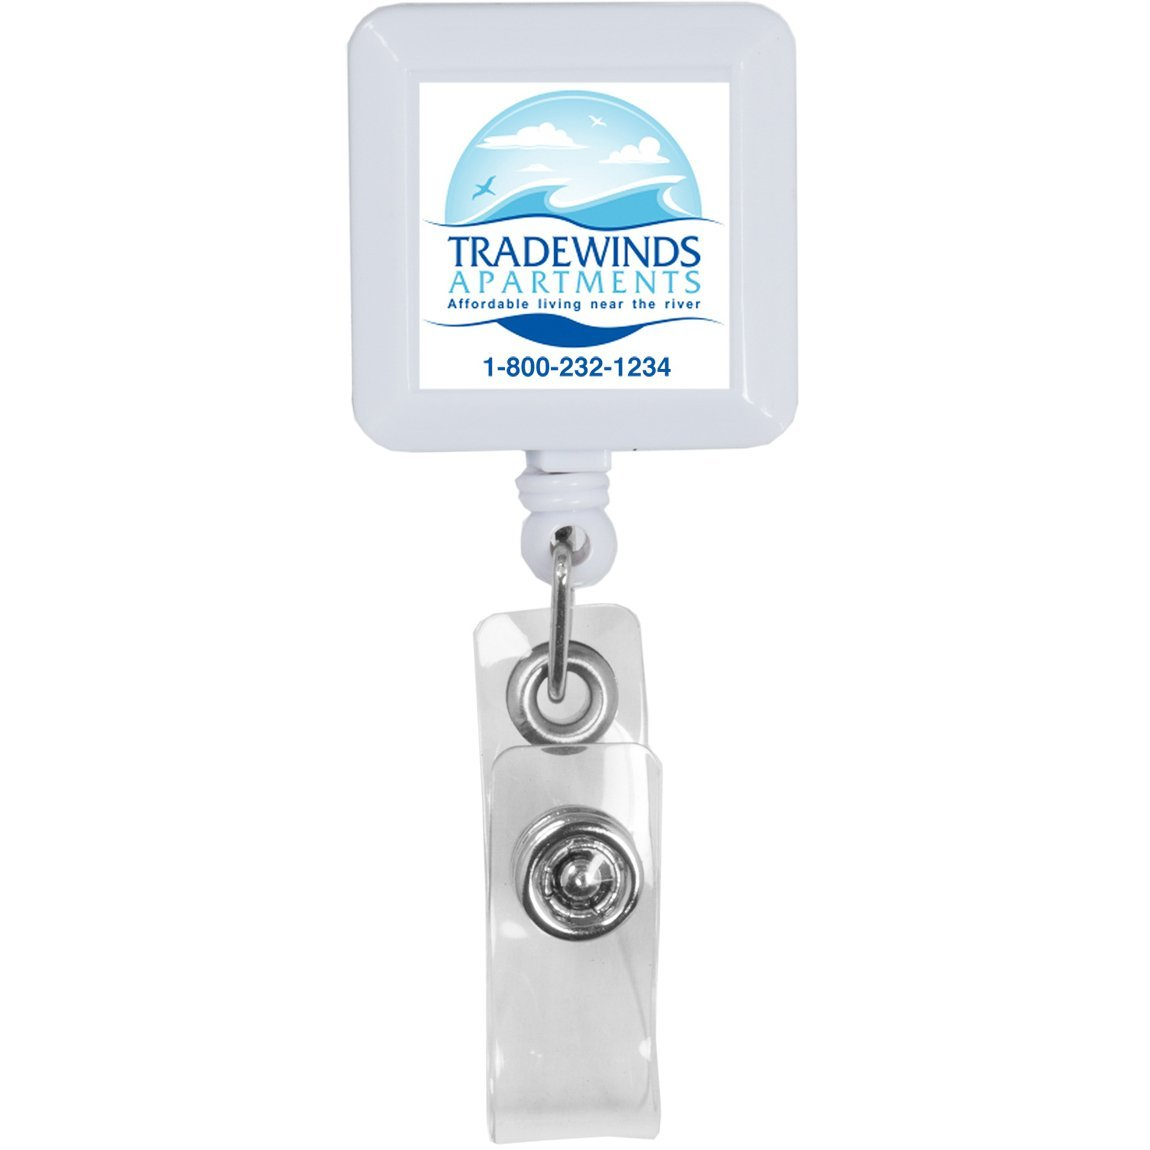 Retractable Badge Holders | Jobox Media